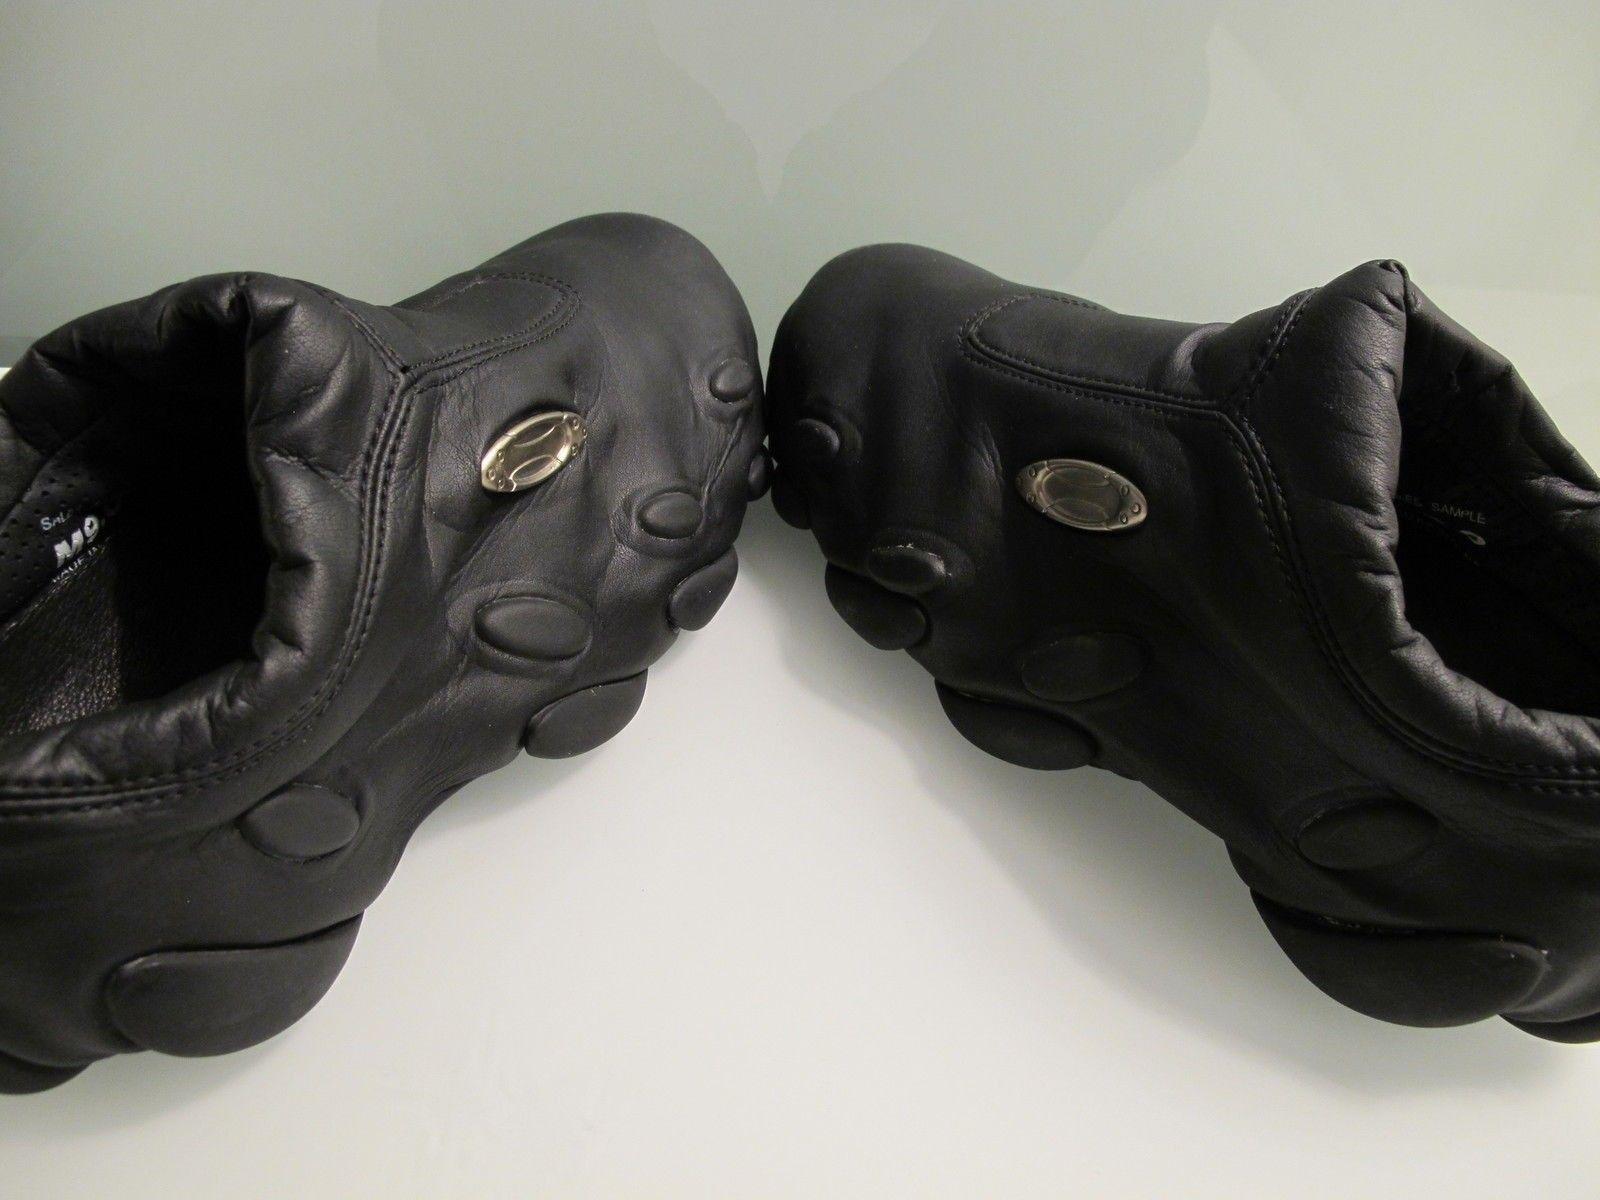 Arrowhead/ Flesh Prototype Shoes...anyone has any info on this? - $_57 (3).jpg